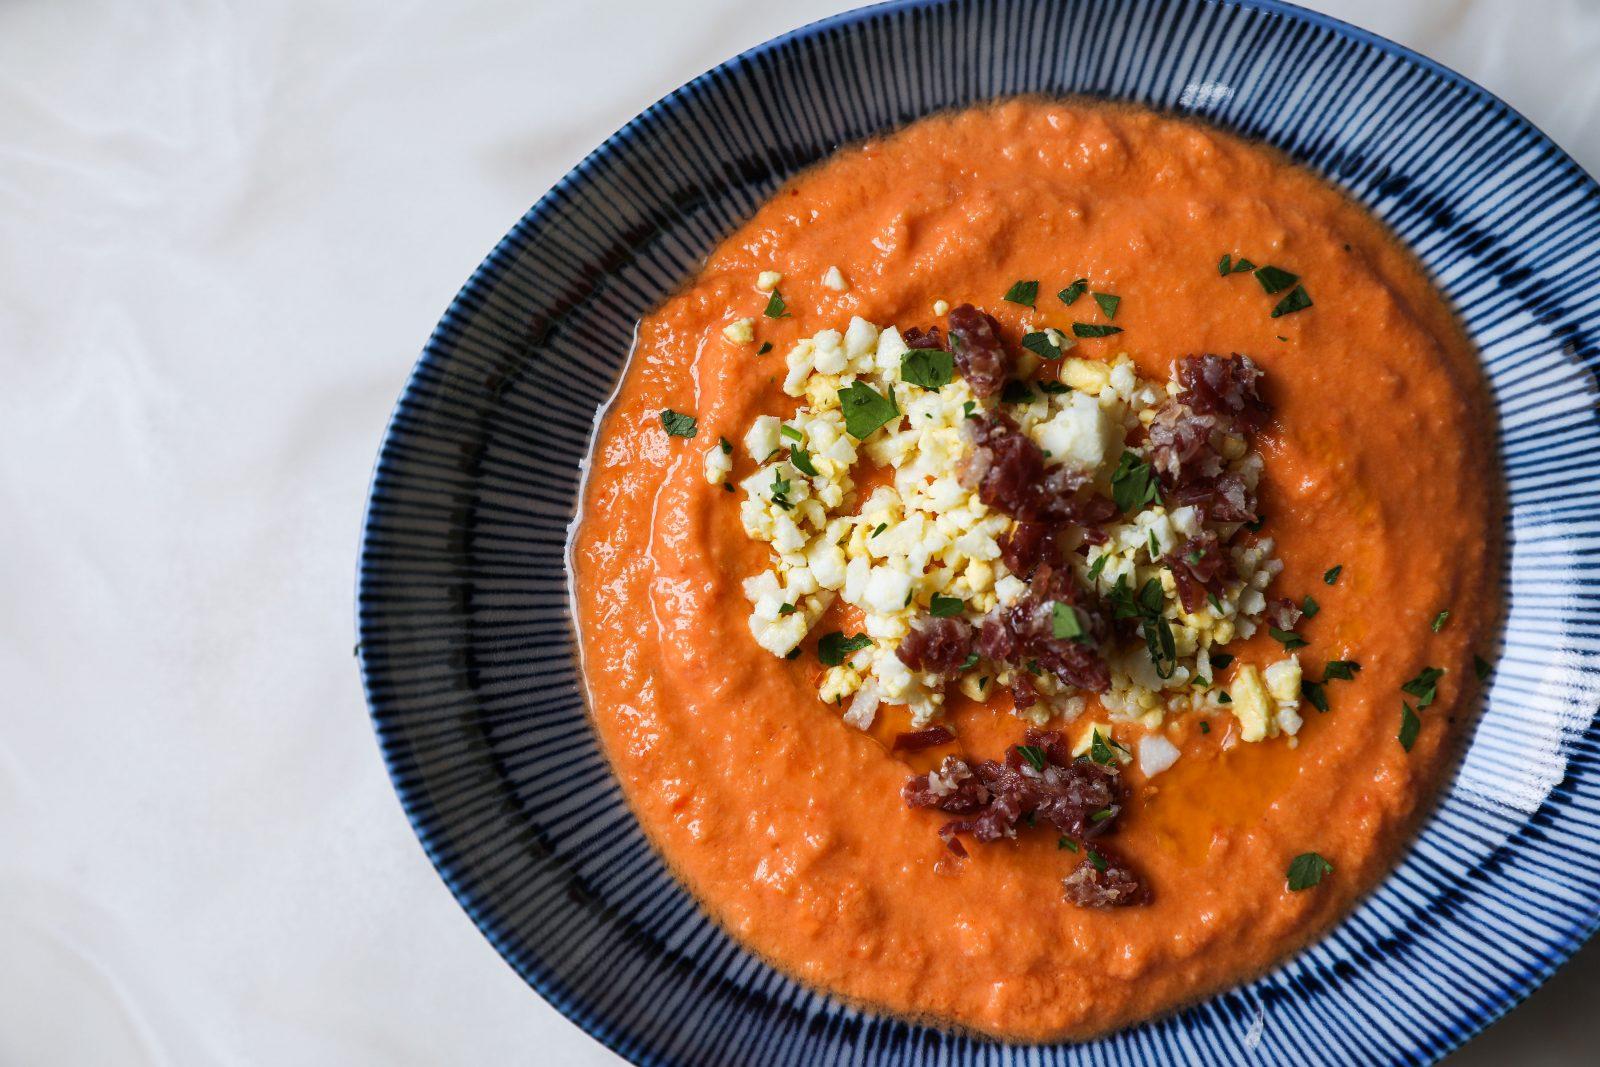 Tomato Salmorejo, Spanish foods, topped with egg, bacon, white marble table lola restaurant